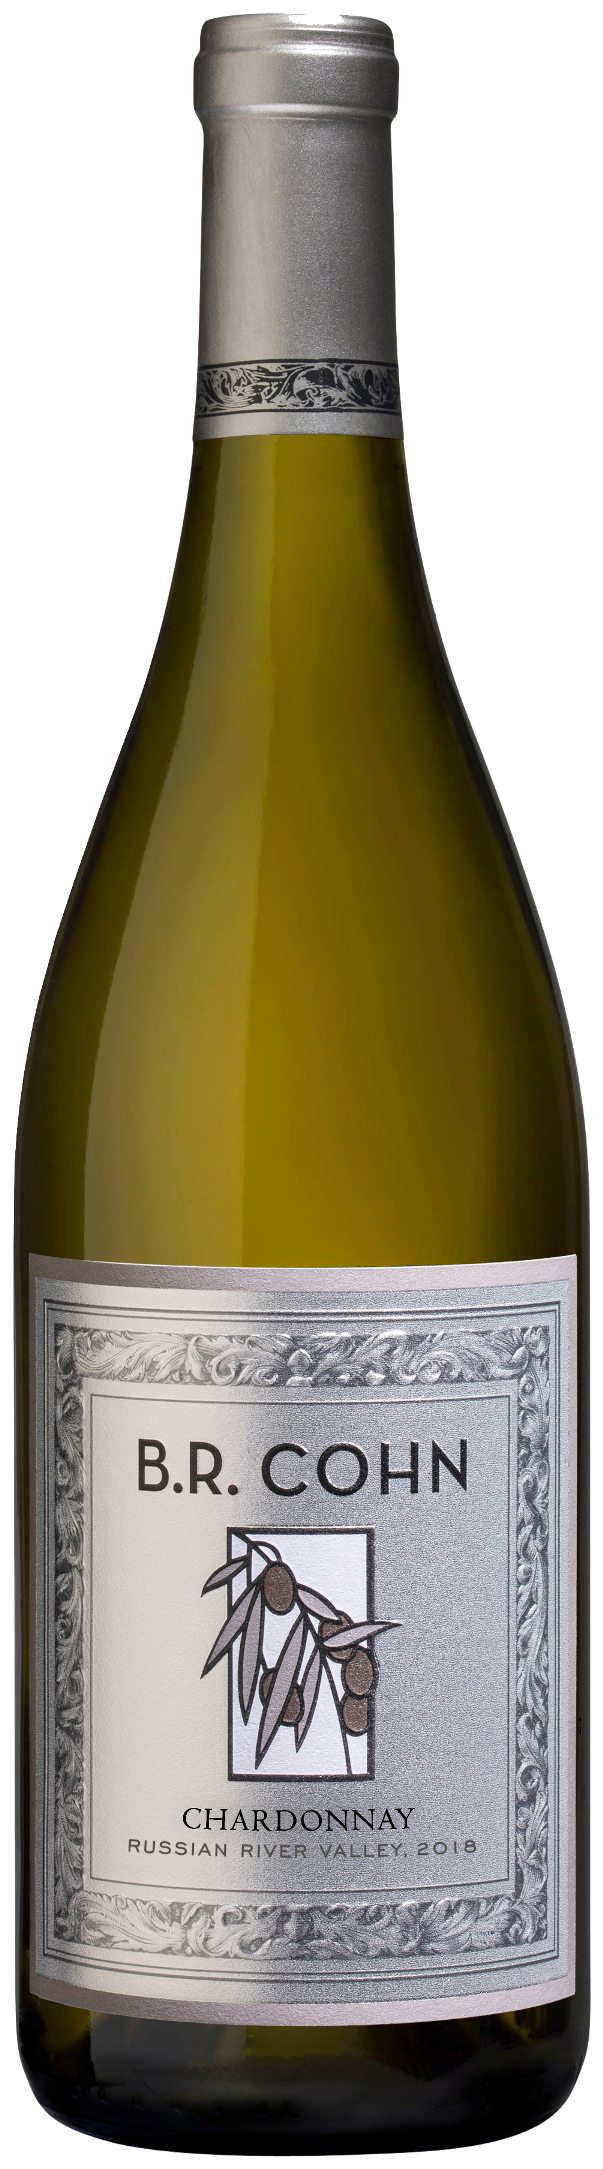 B.R COHN Chardonnay